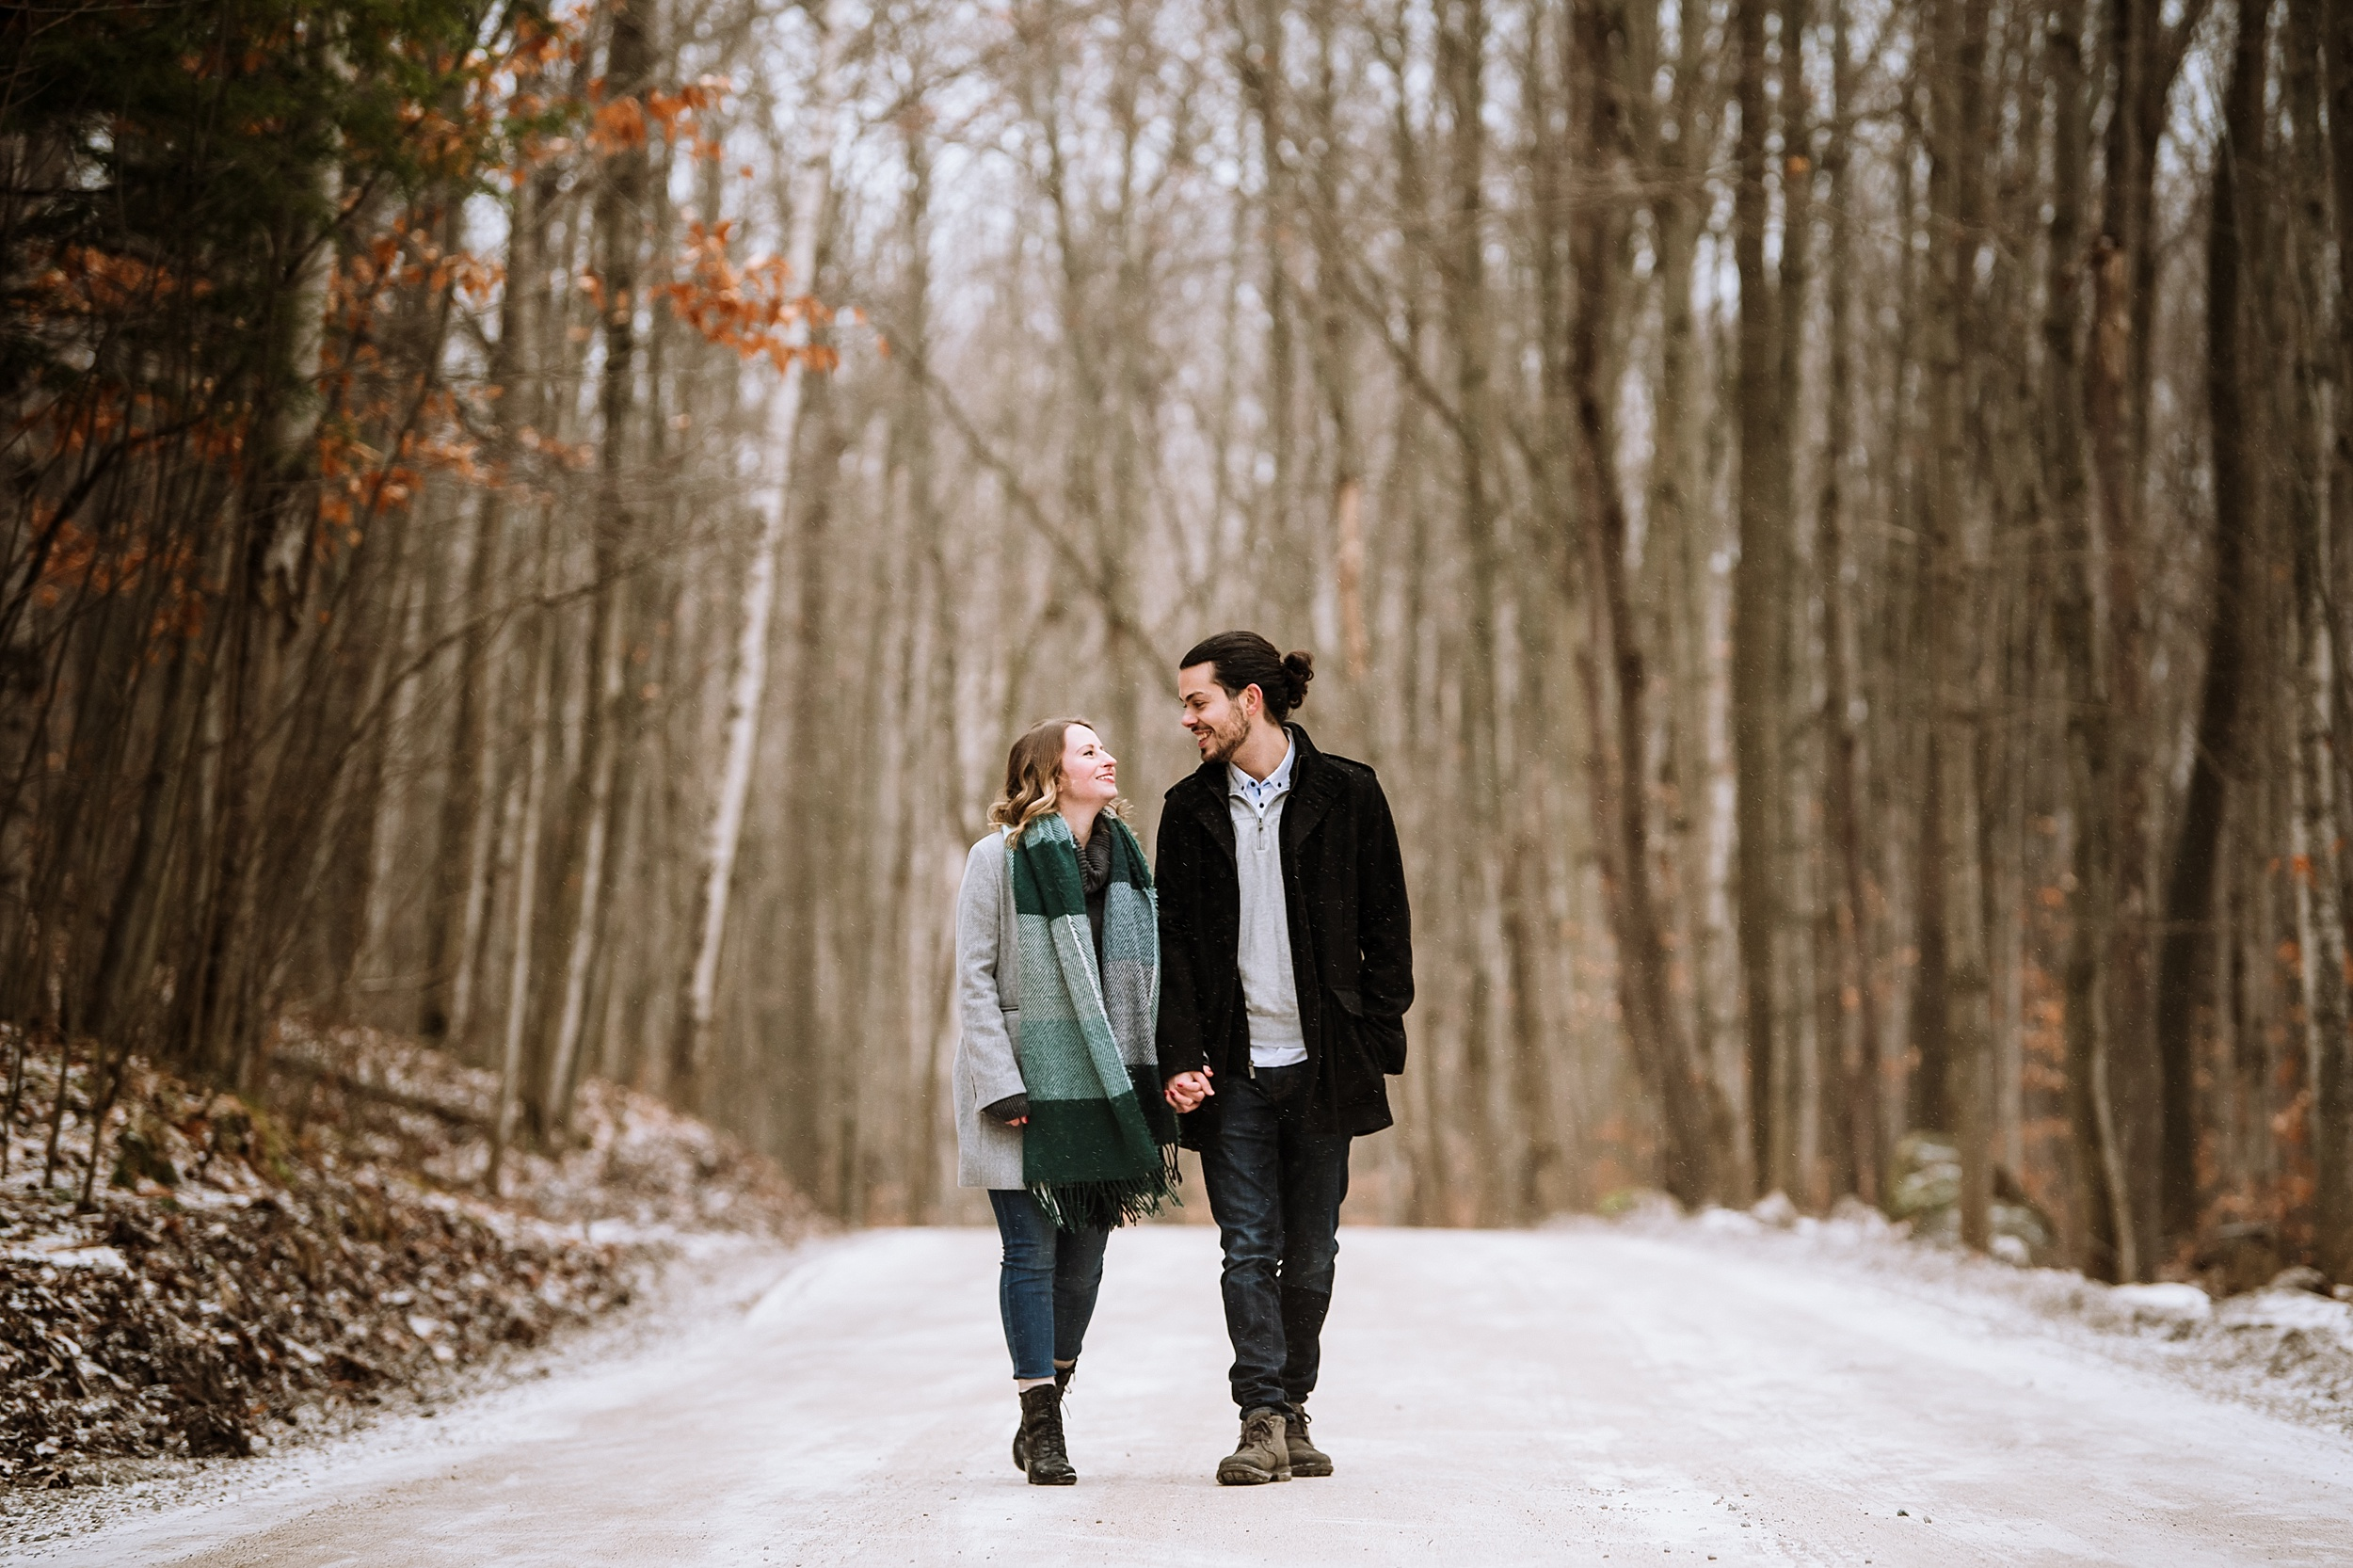 Tiny_Ontario_Engagement_shoot_Toronto_Photographer_0008.jpg